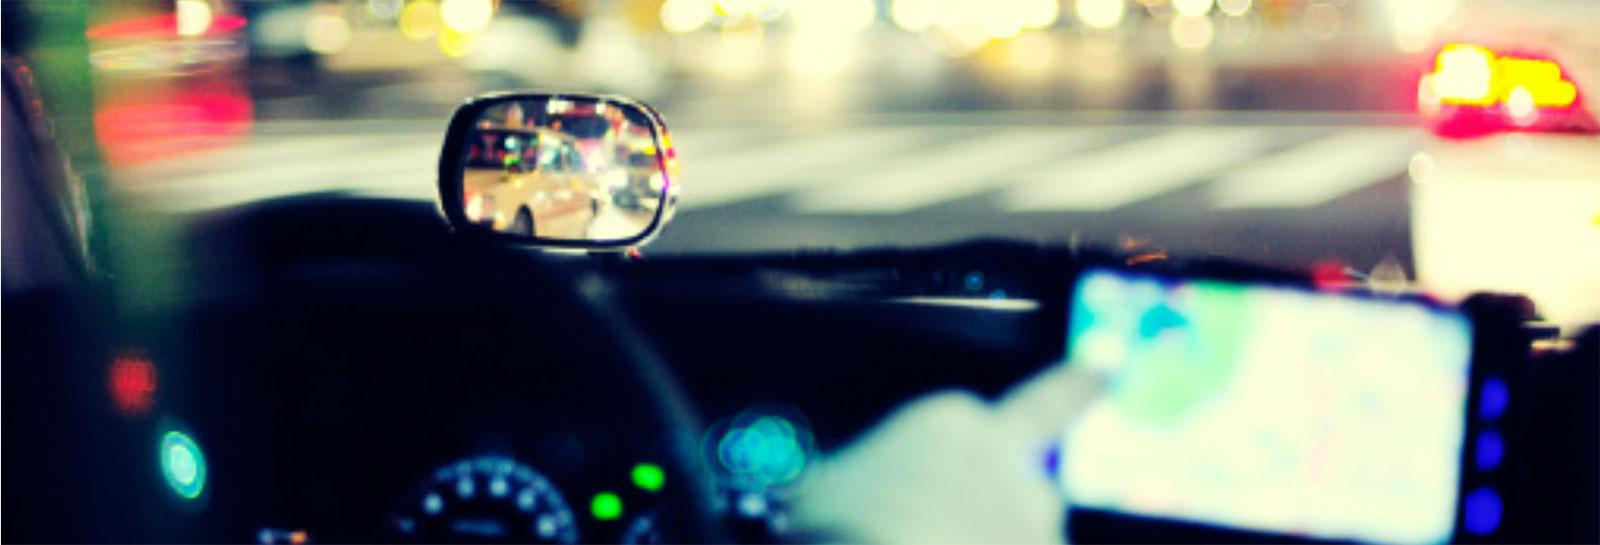 a blurred image of a car's dashboard